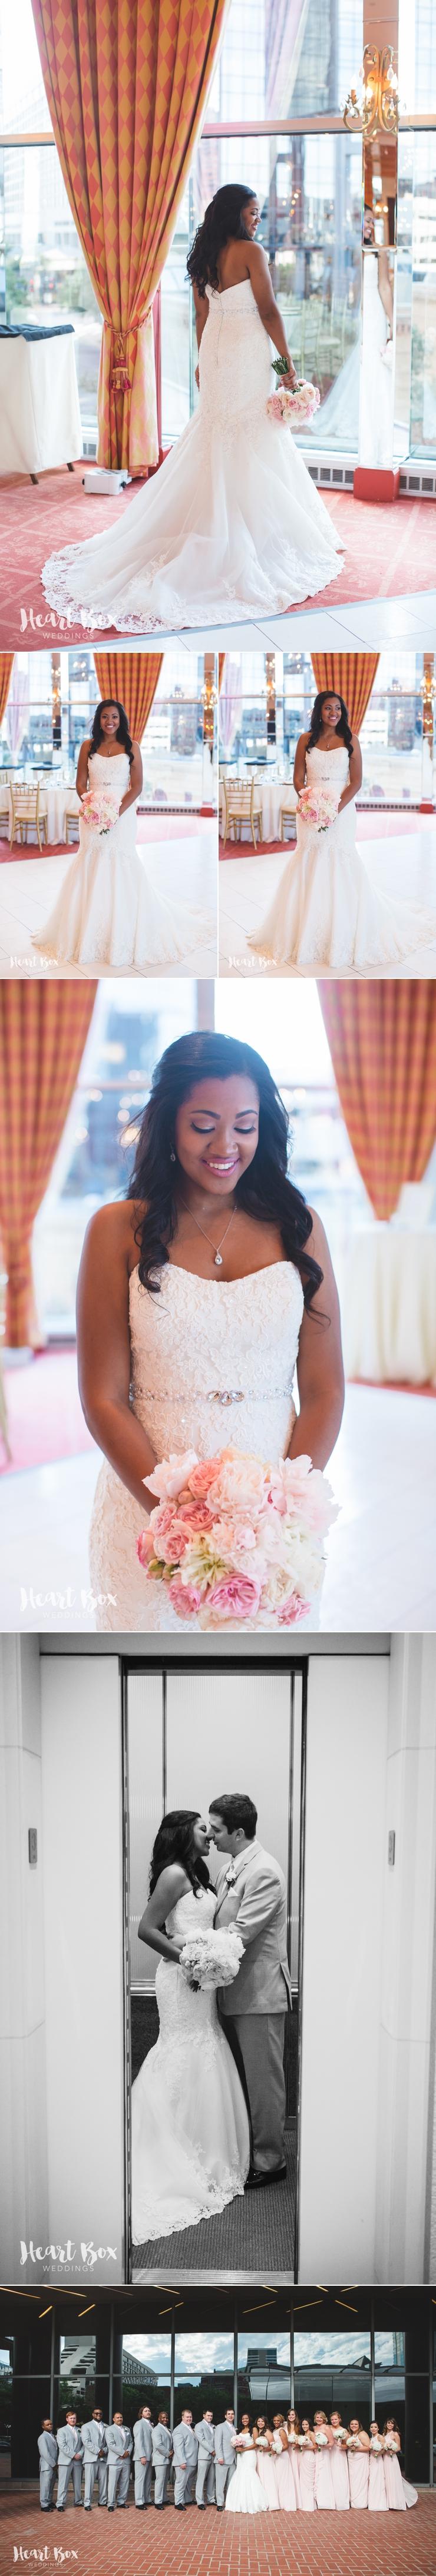 Smith Wedding Blog Collages 7.jpg